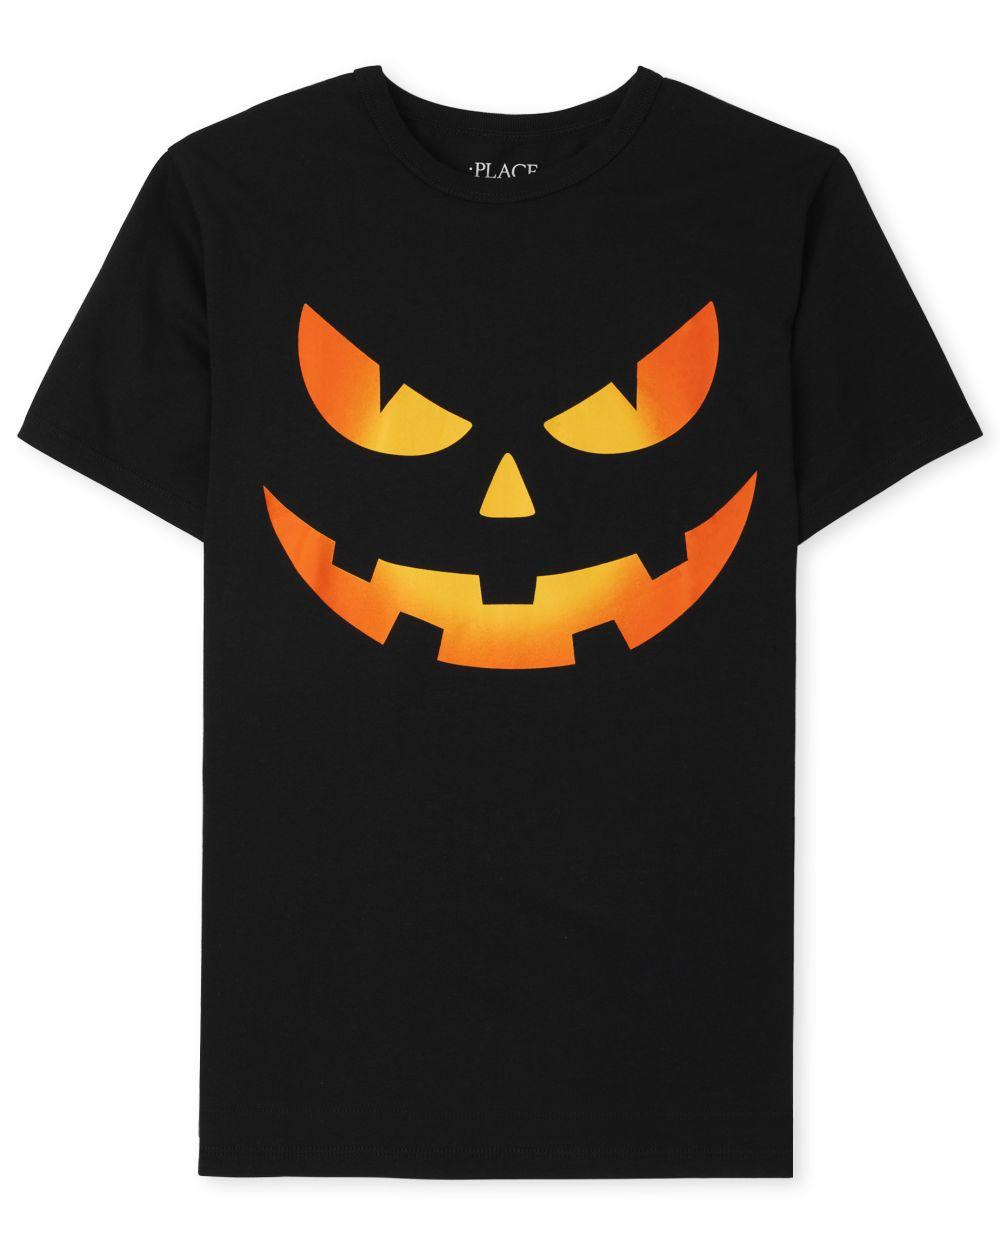 Boys Pumpkin Face Graphic Tee - Black T-Shirt